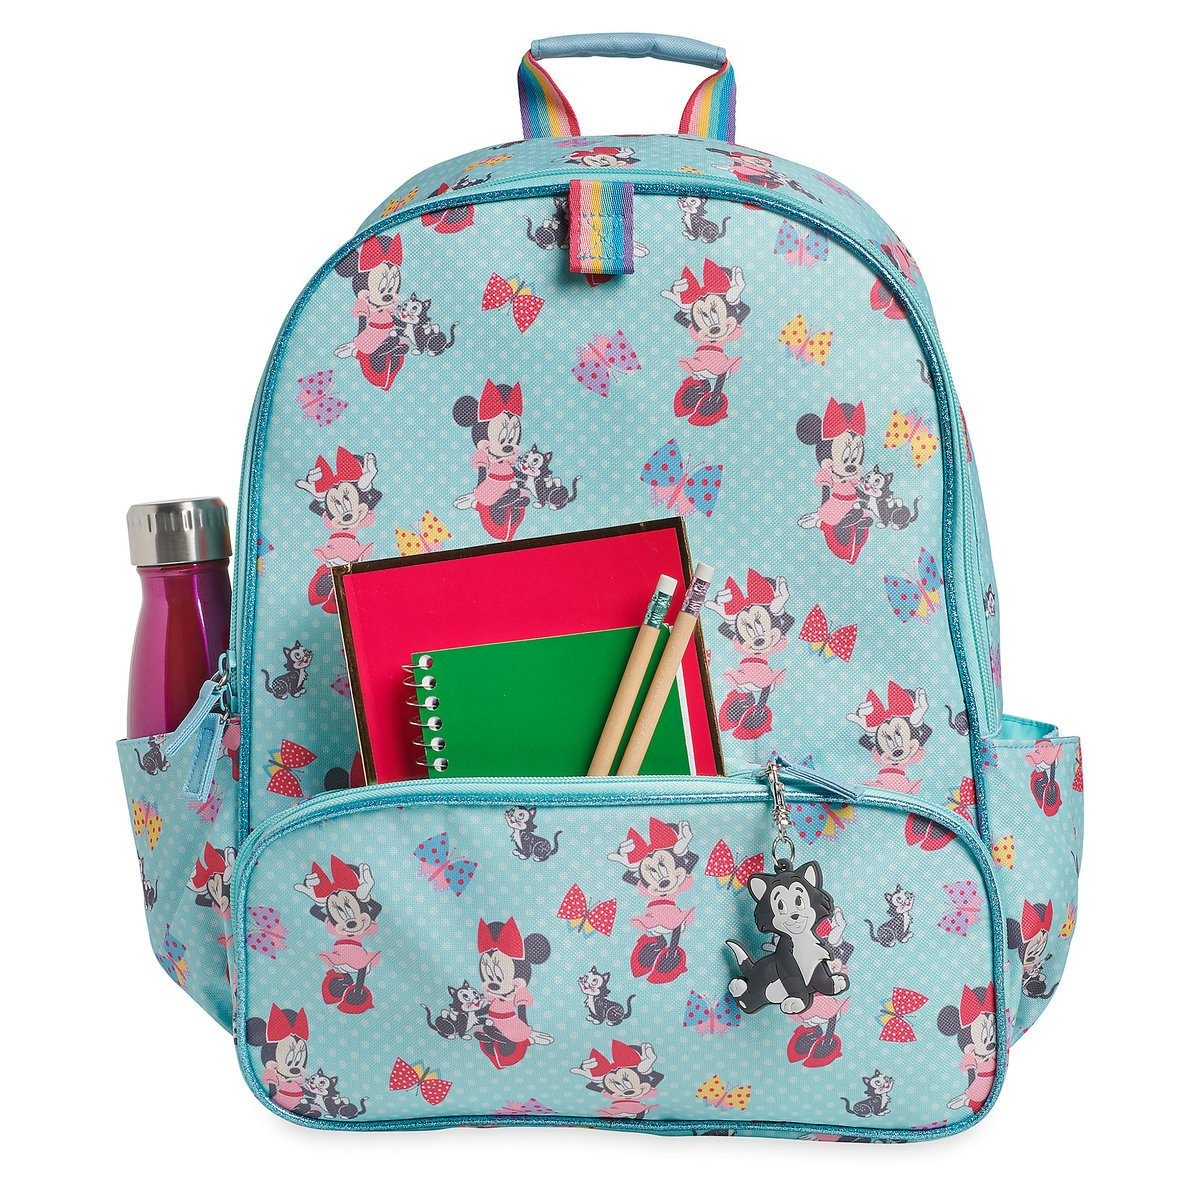 423b0c5a1 Disney Minnie Mouse Backpack for Kids - Pink 427255770968: Amazon.com.au:  Fashion